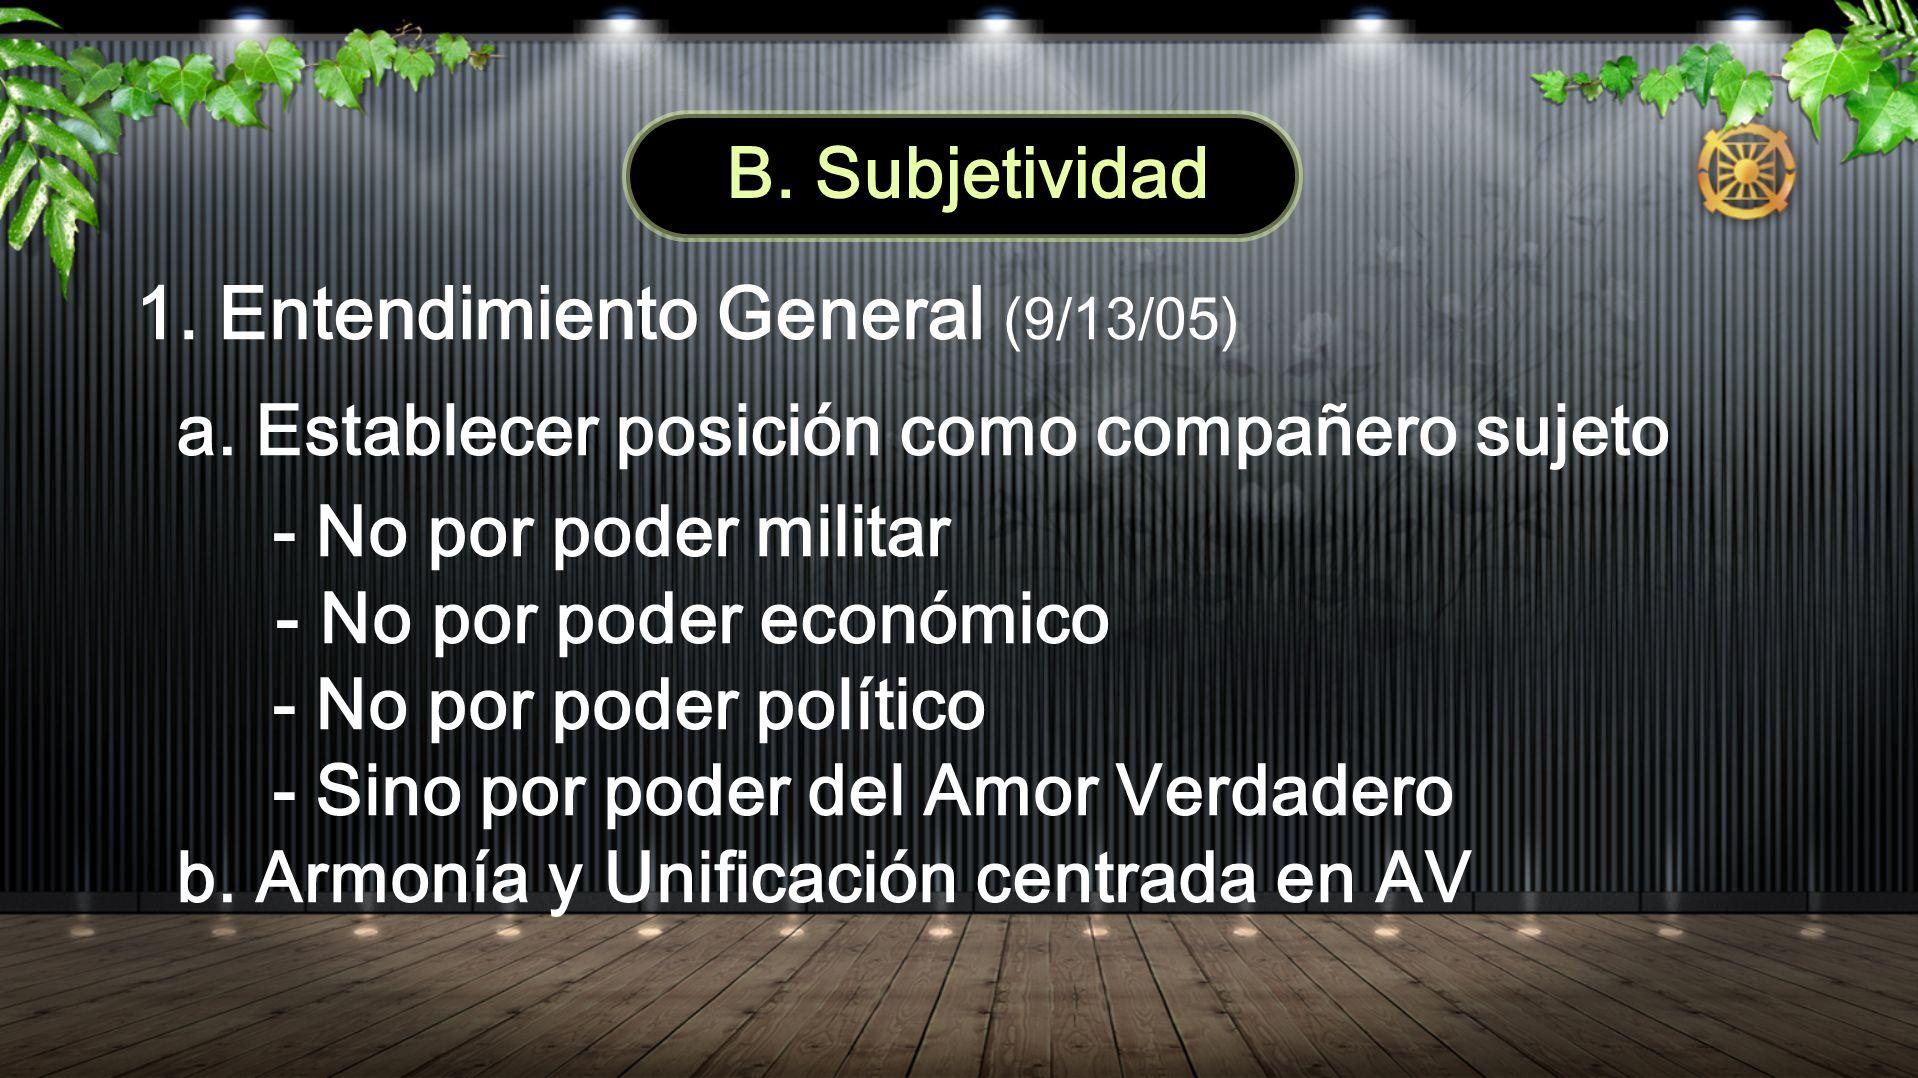 B. Subjetividad 1. Entendimiento General (9/13/05) a. Establecer posición como compañero sujeto - No por poder militar - No por poder económico - No p